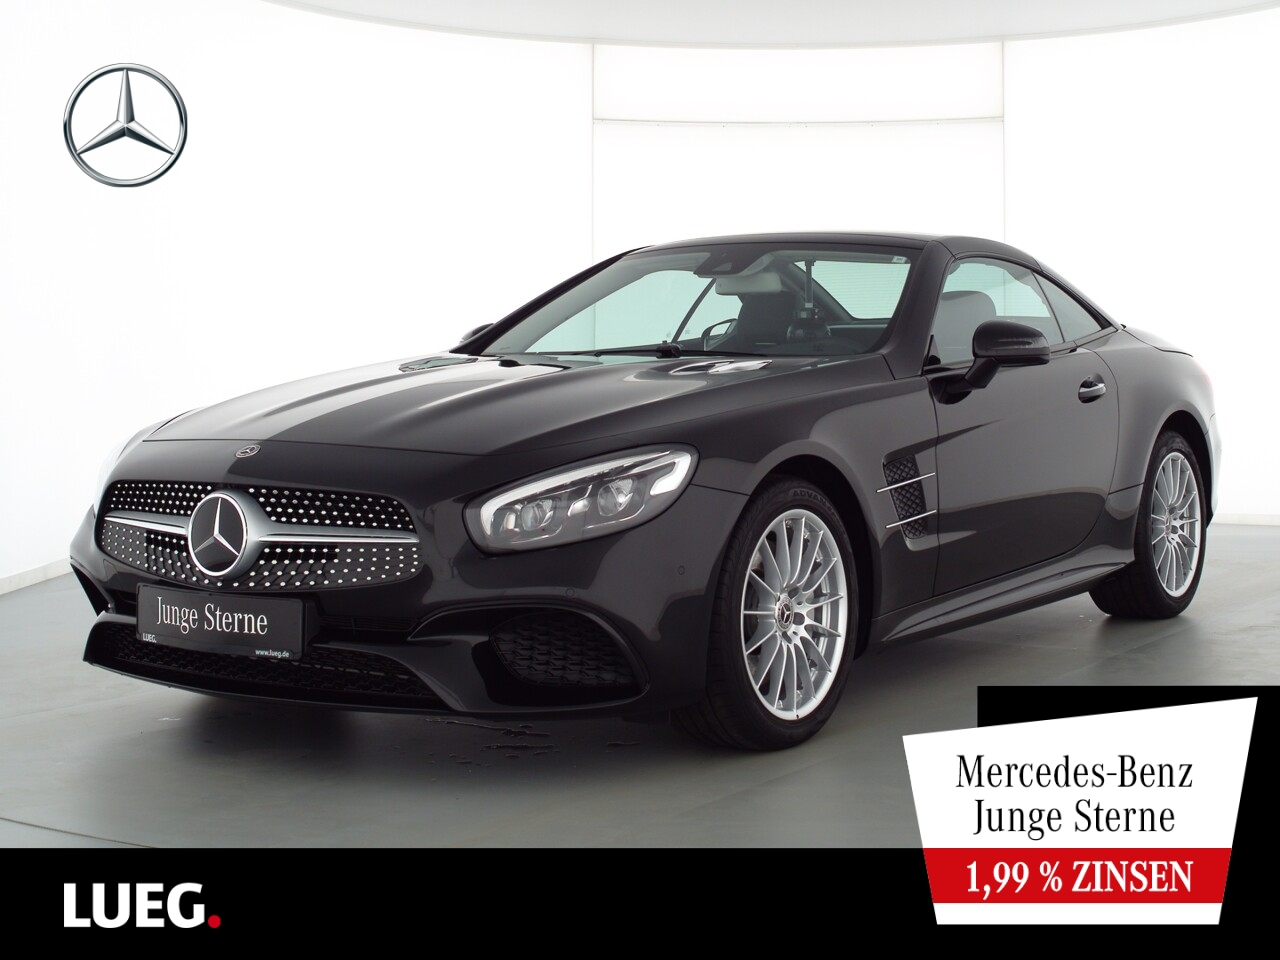 Mercedes-Benz SL 400 AMG+COM+PanoV+LED-ILS+KeylGo+AIRSCARF+RFK, Jahr 2020, Benzin